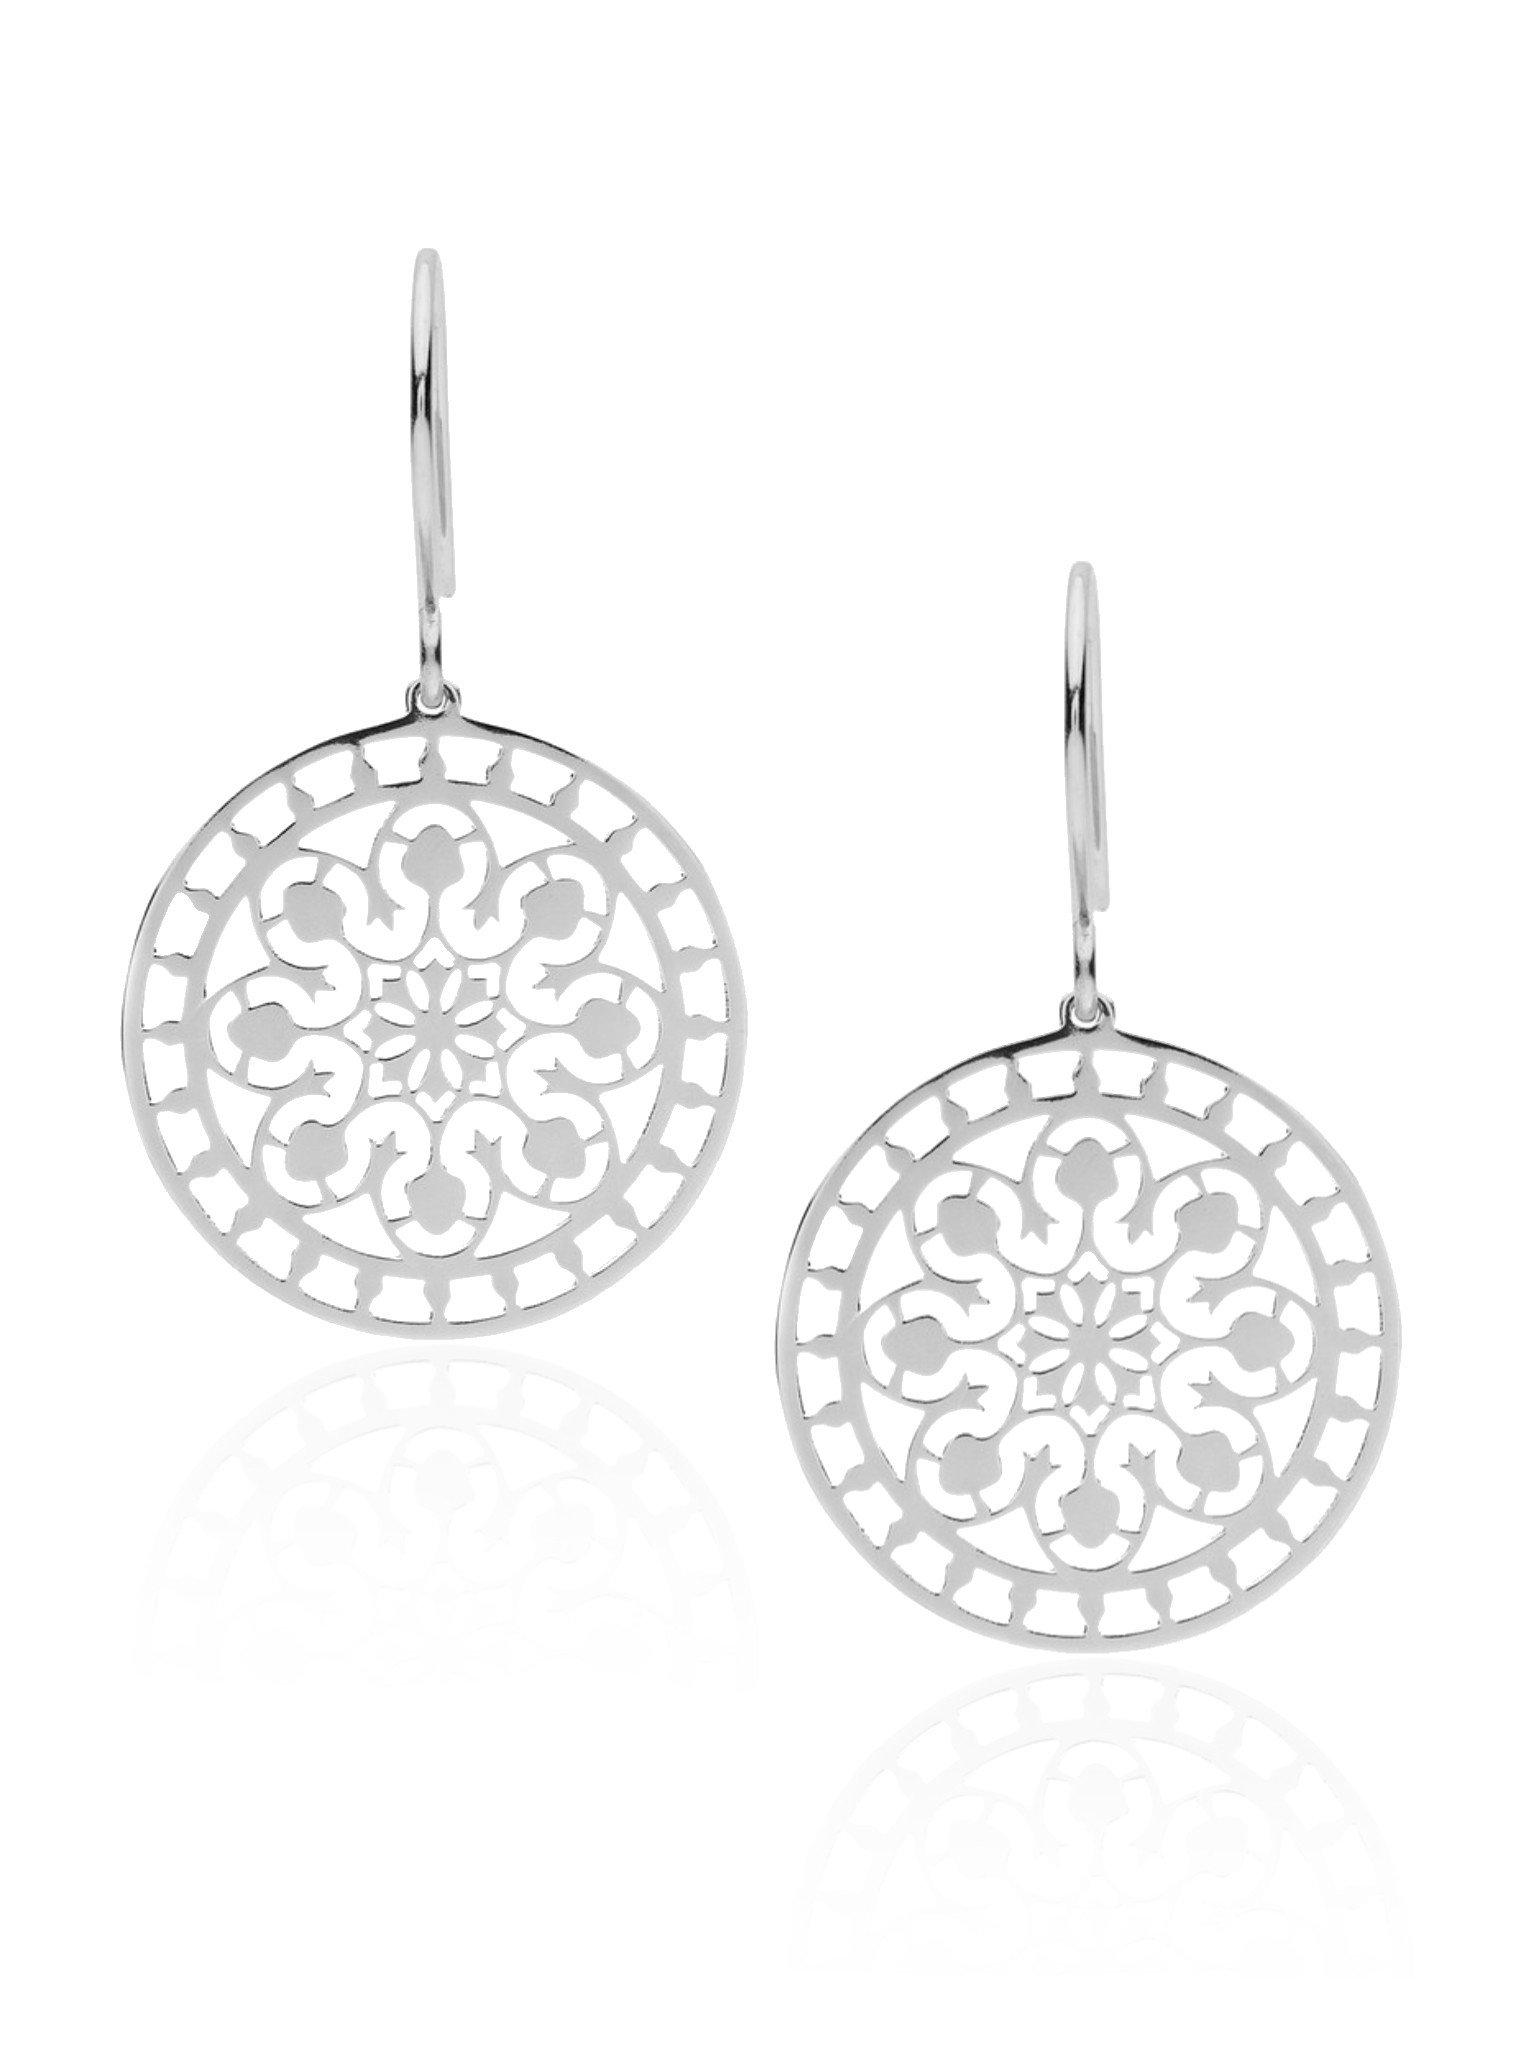 Pastiche Tahiti Earrings in Silver